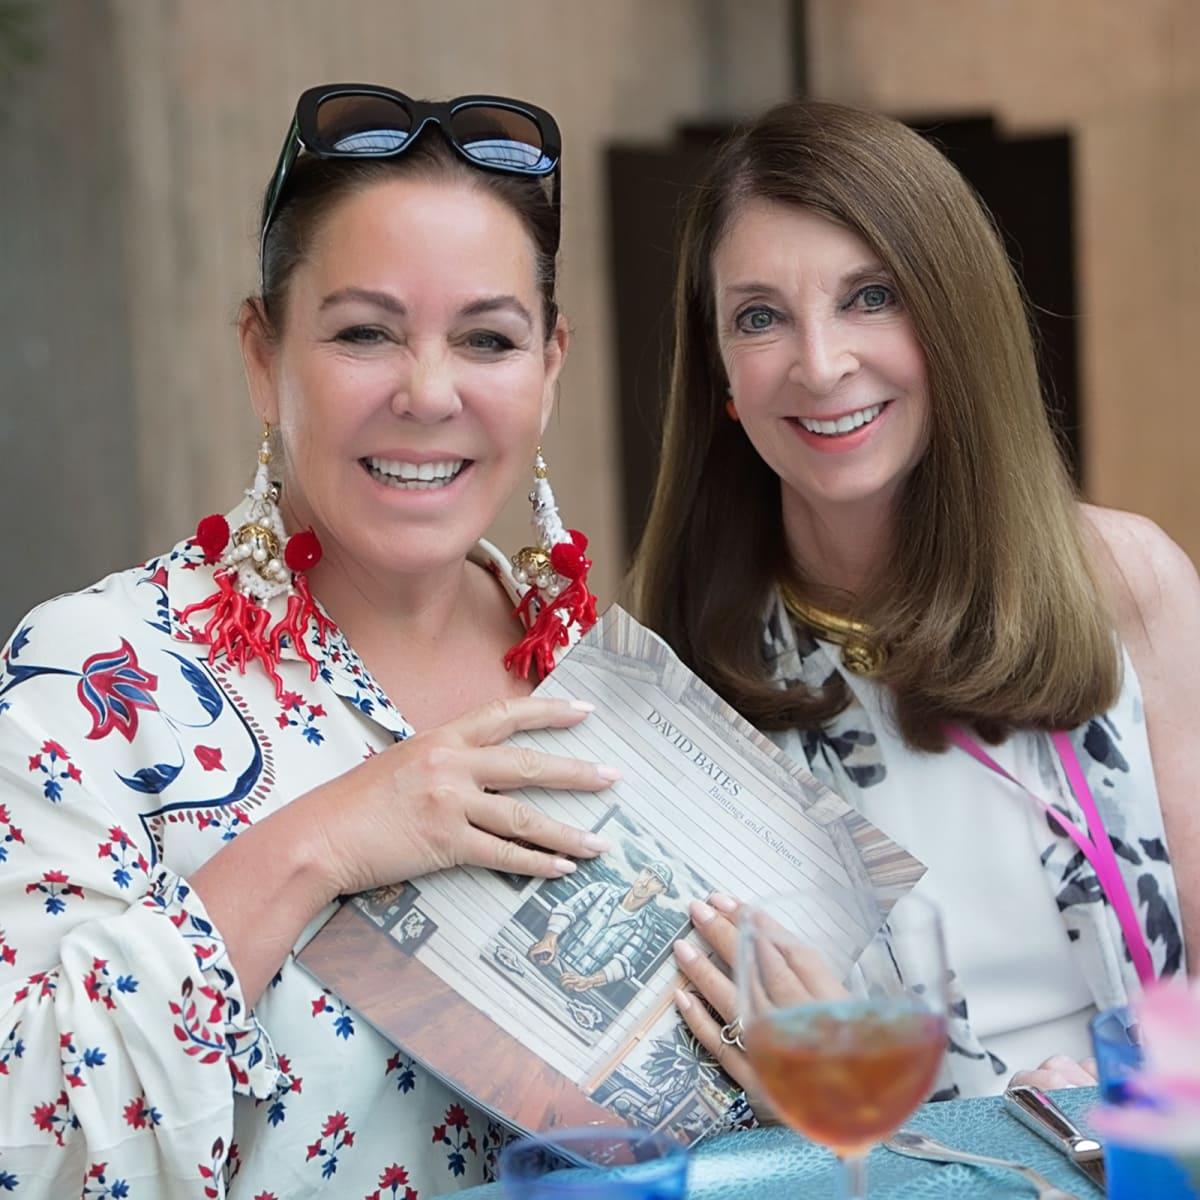 Texas Women for the Arts, Michelle Nussbaumer (Dallas) and Marsland Moncrief (FW)